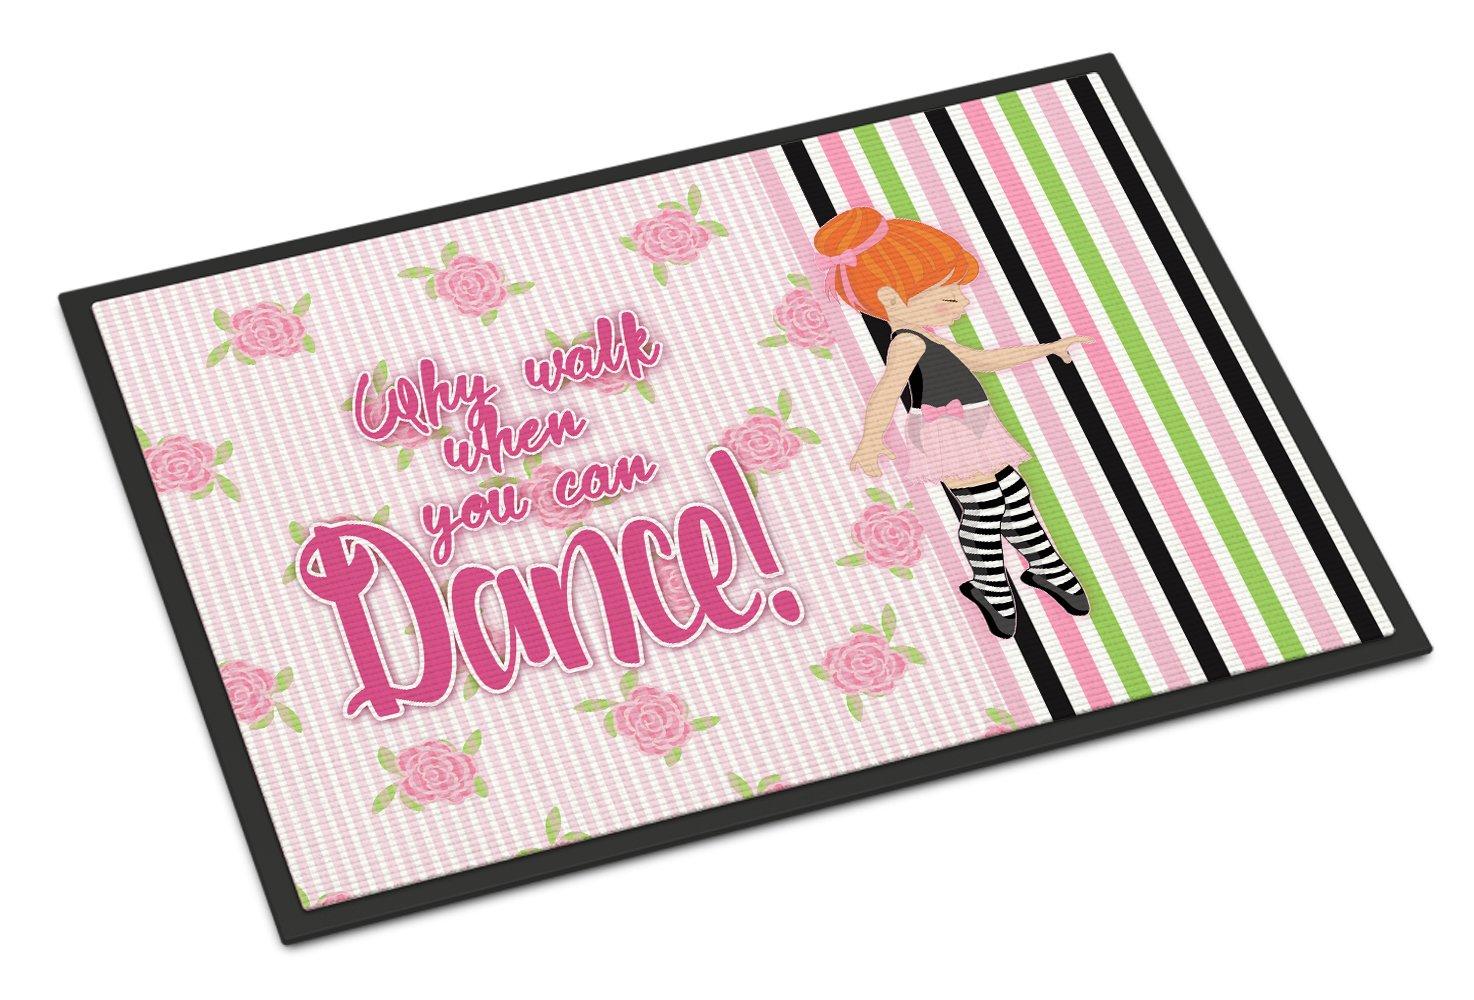 Caroline's Treasures Ballet Dance Stripes Red Hair Doormat, 18 H x 27 W'', Multicolor